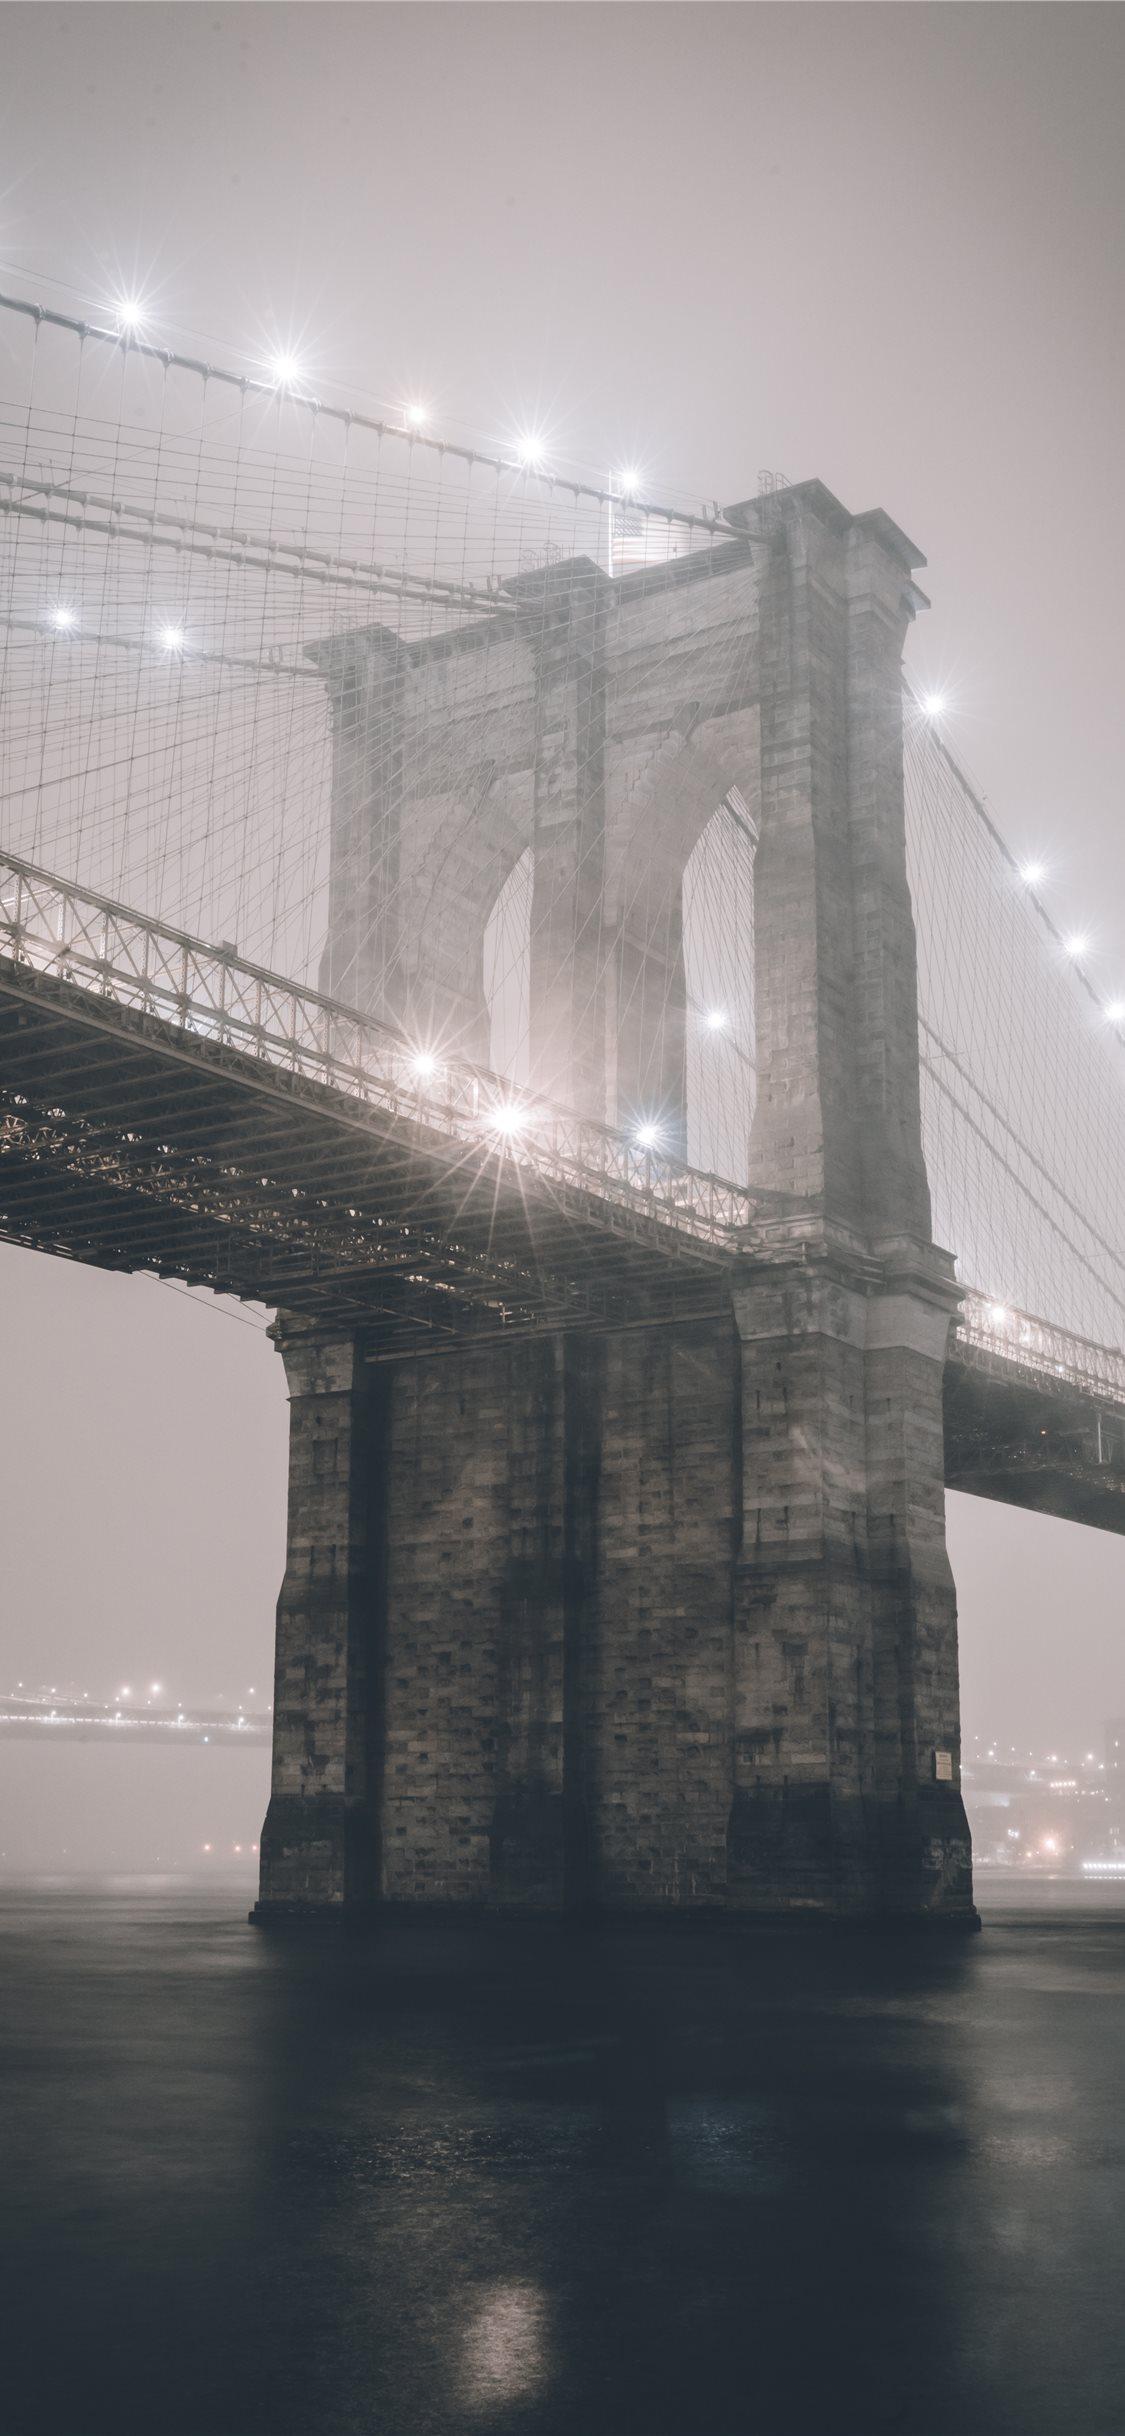 Brooklyn Bridge New York United States Iphone X Wallpapers